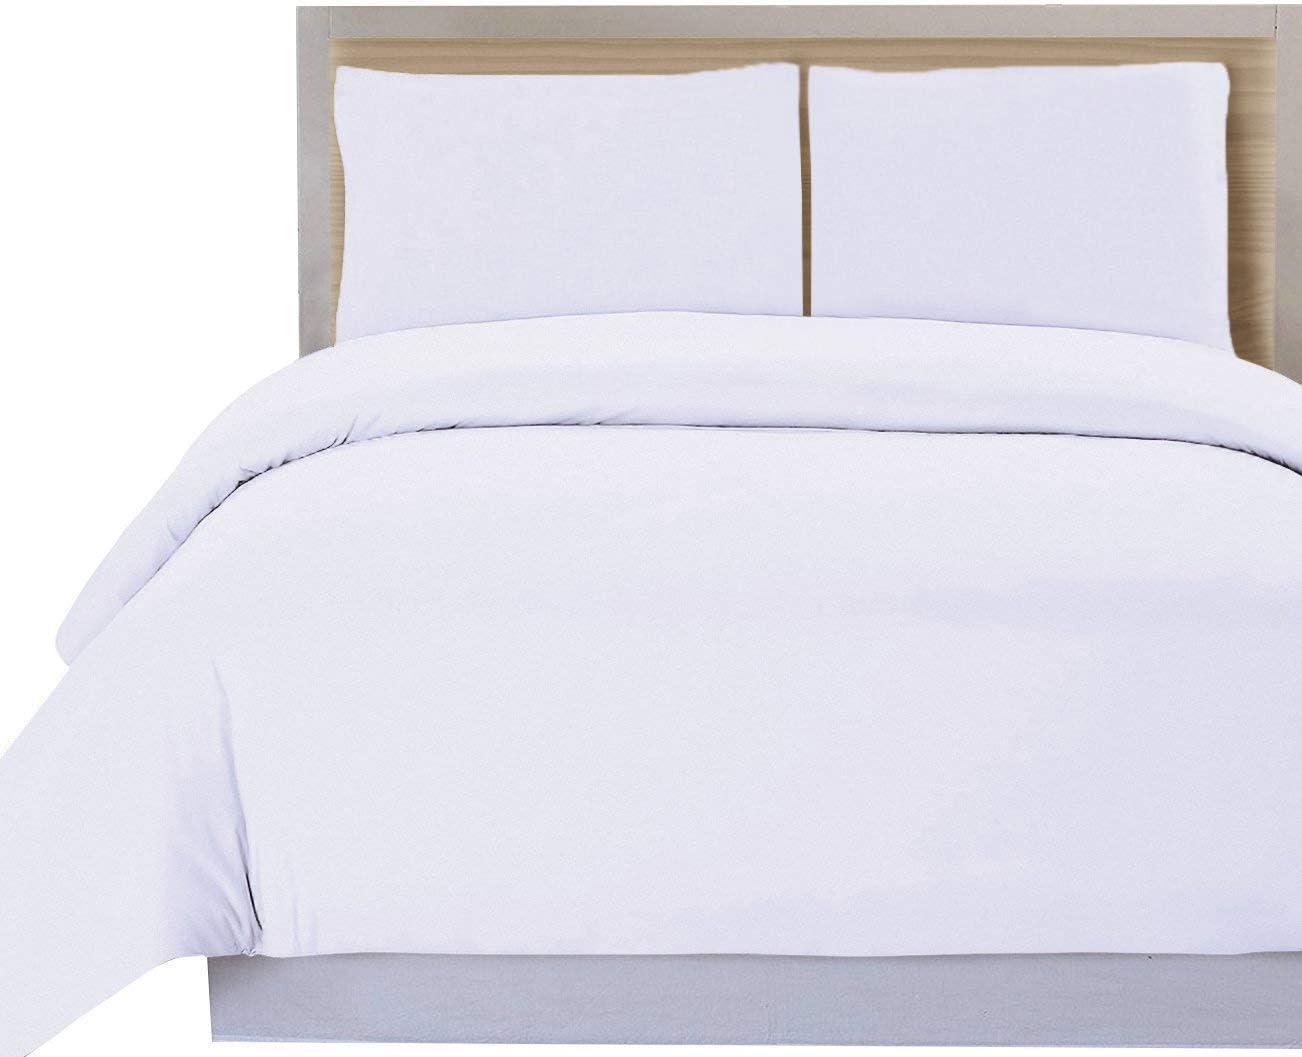 DHestia Hostelería - Funda Nórdica para Edredón Blanca Hotel 50% Algodón 50% Poliéster (270x240 cm - Cama 180)